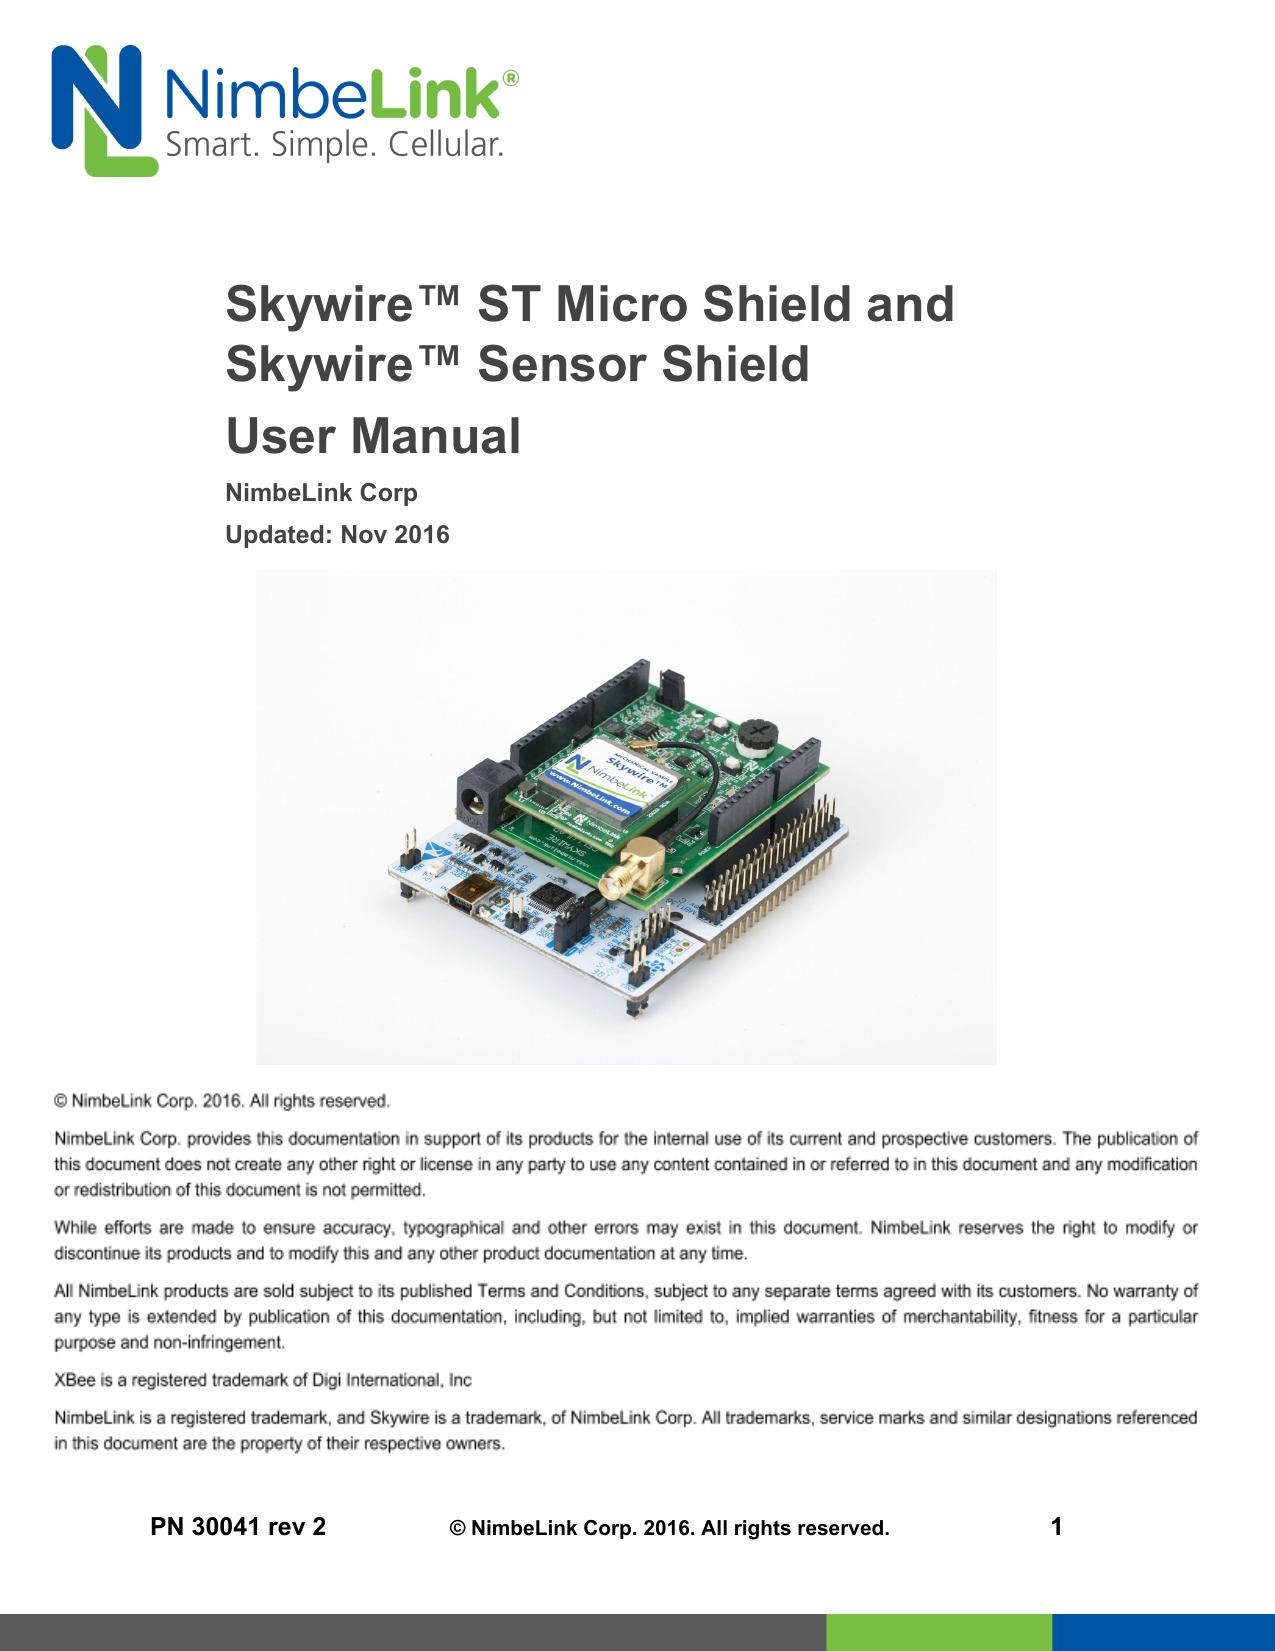 Skywire™ ST Micro Shield and Skywire™ Sensor | manualzz com